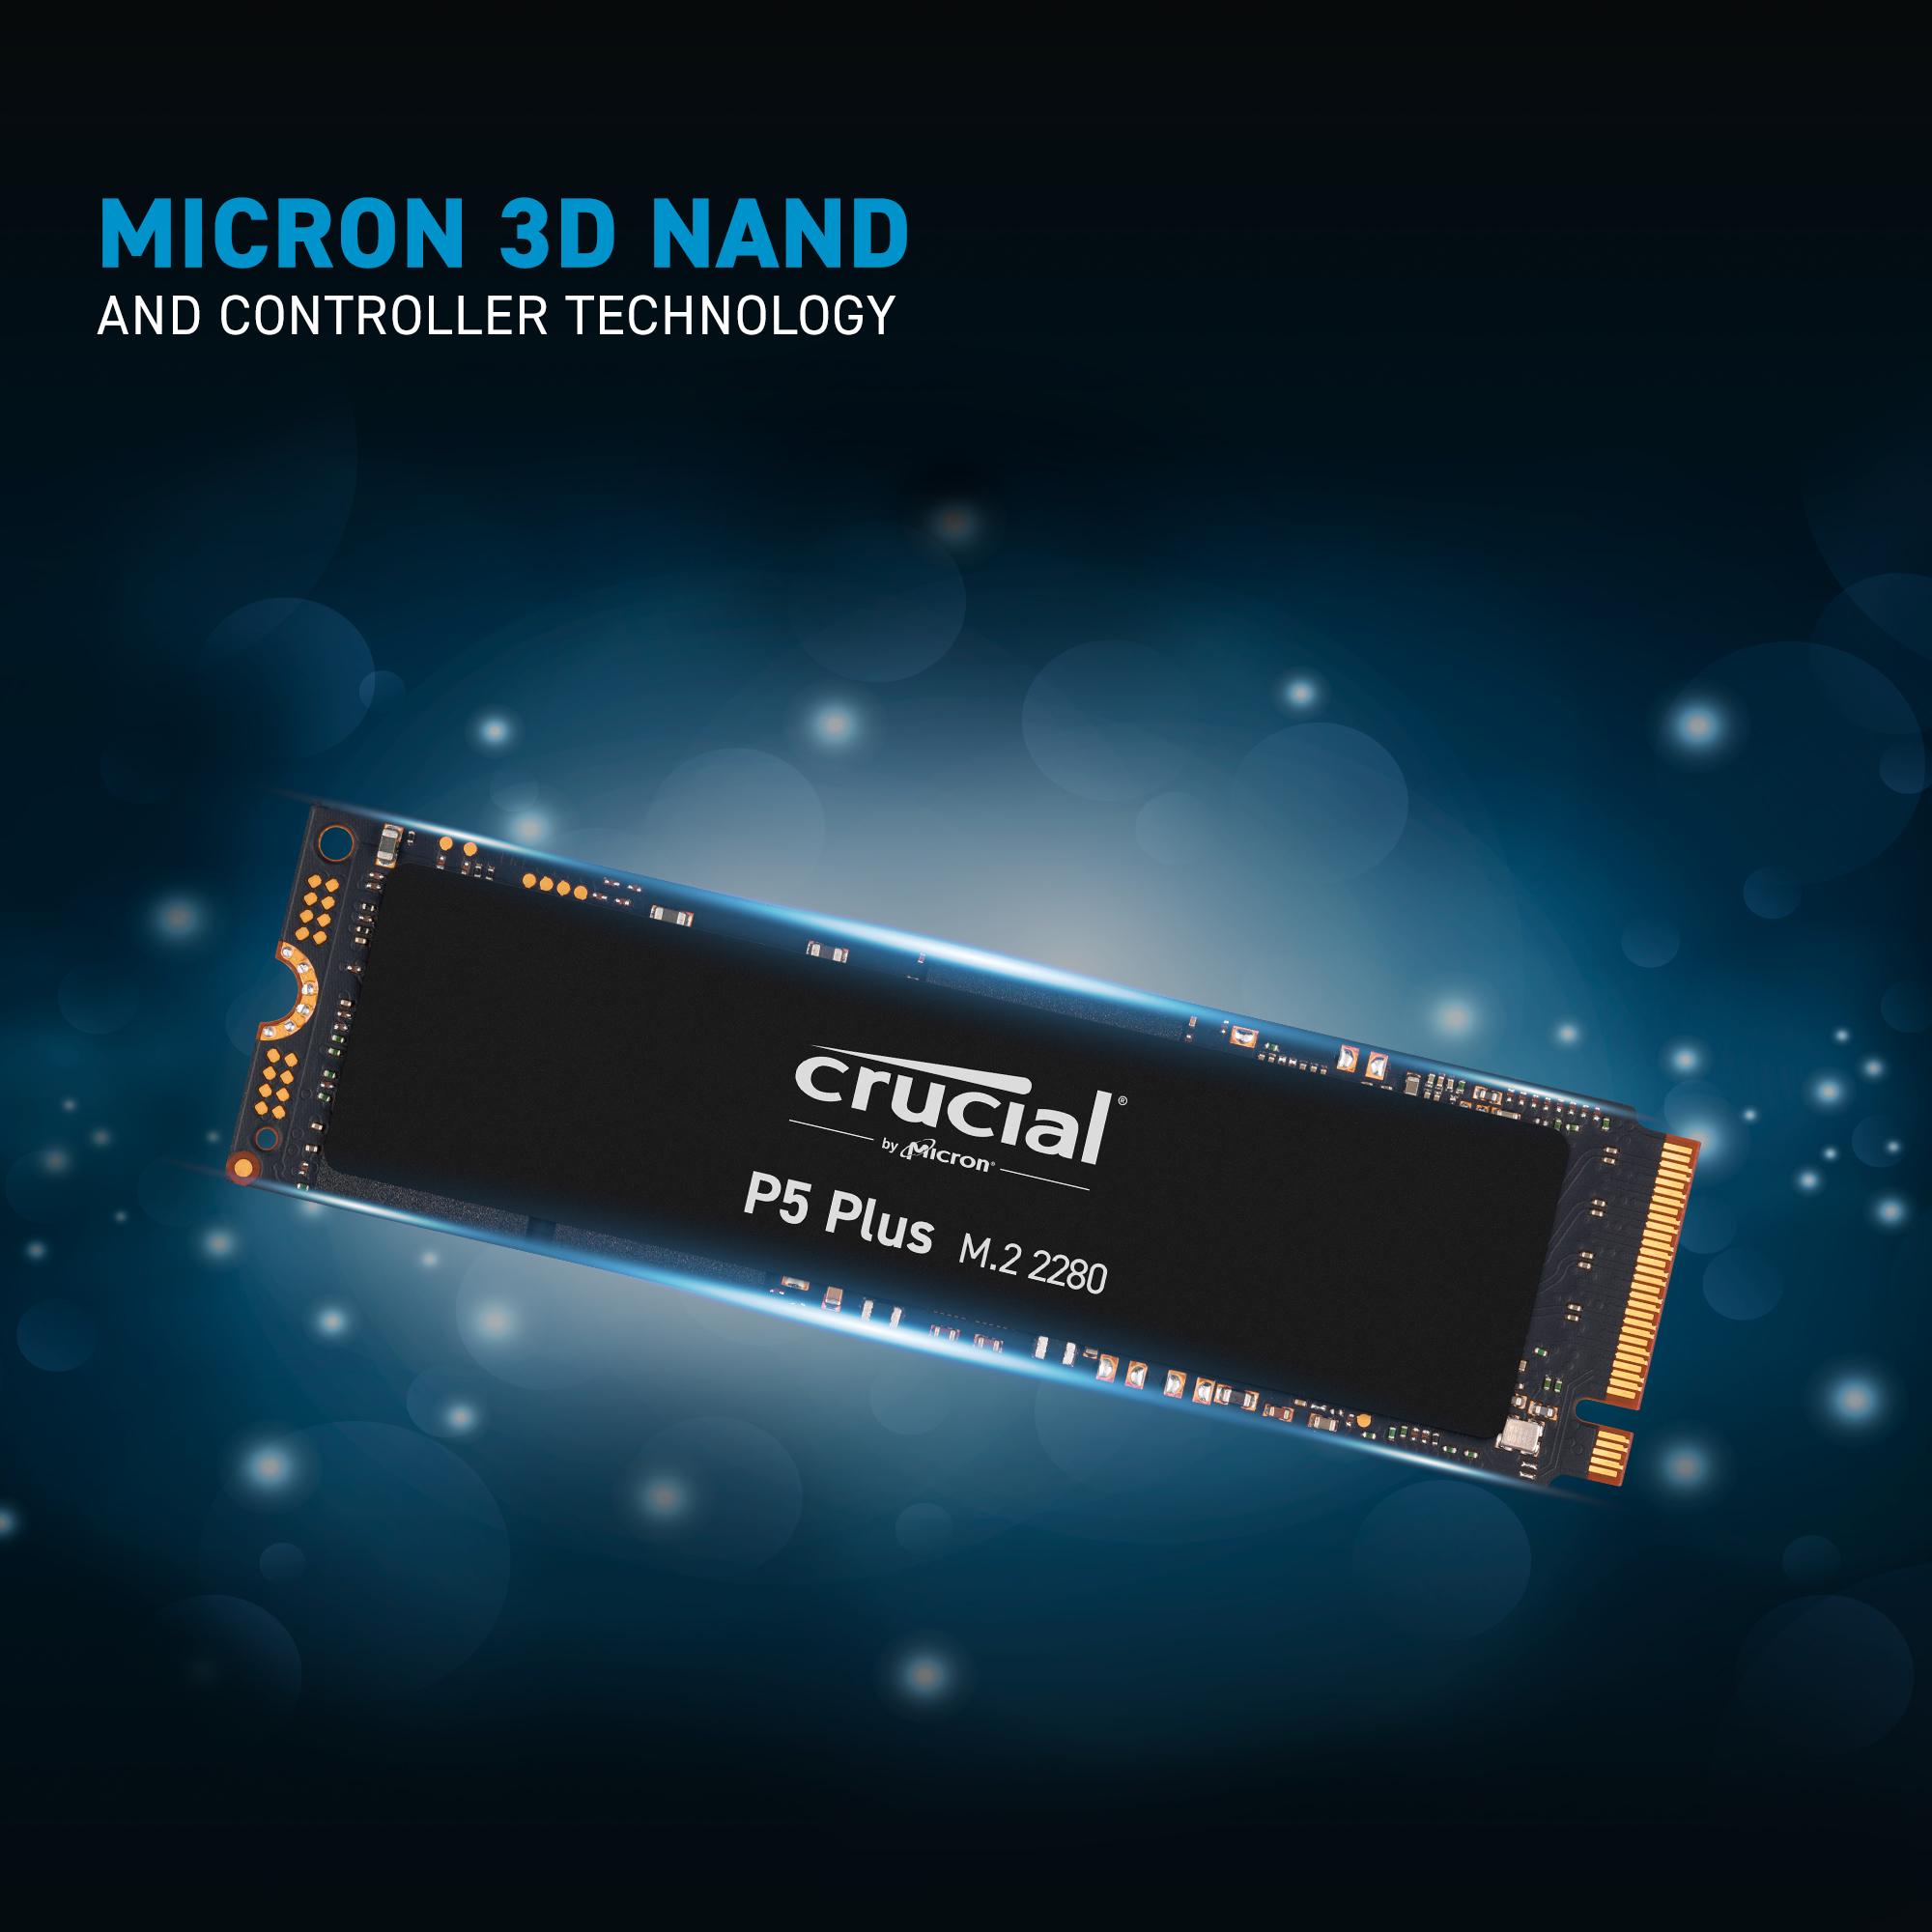 Crucial P5 Plus 1TB PCIe M.2 2280SS SSD- view 7